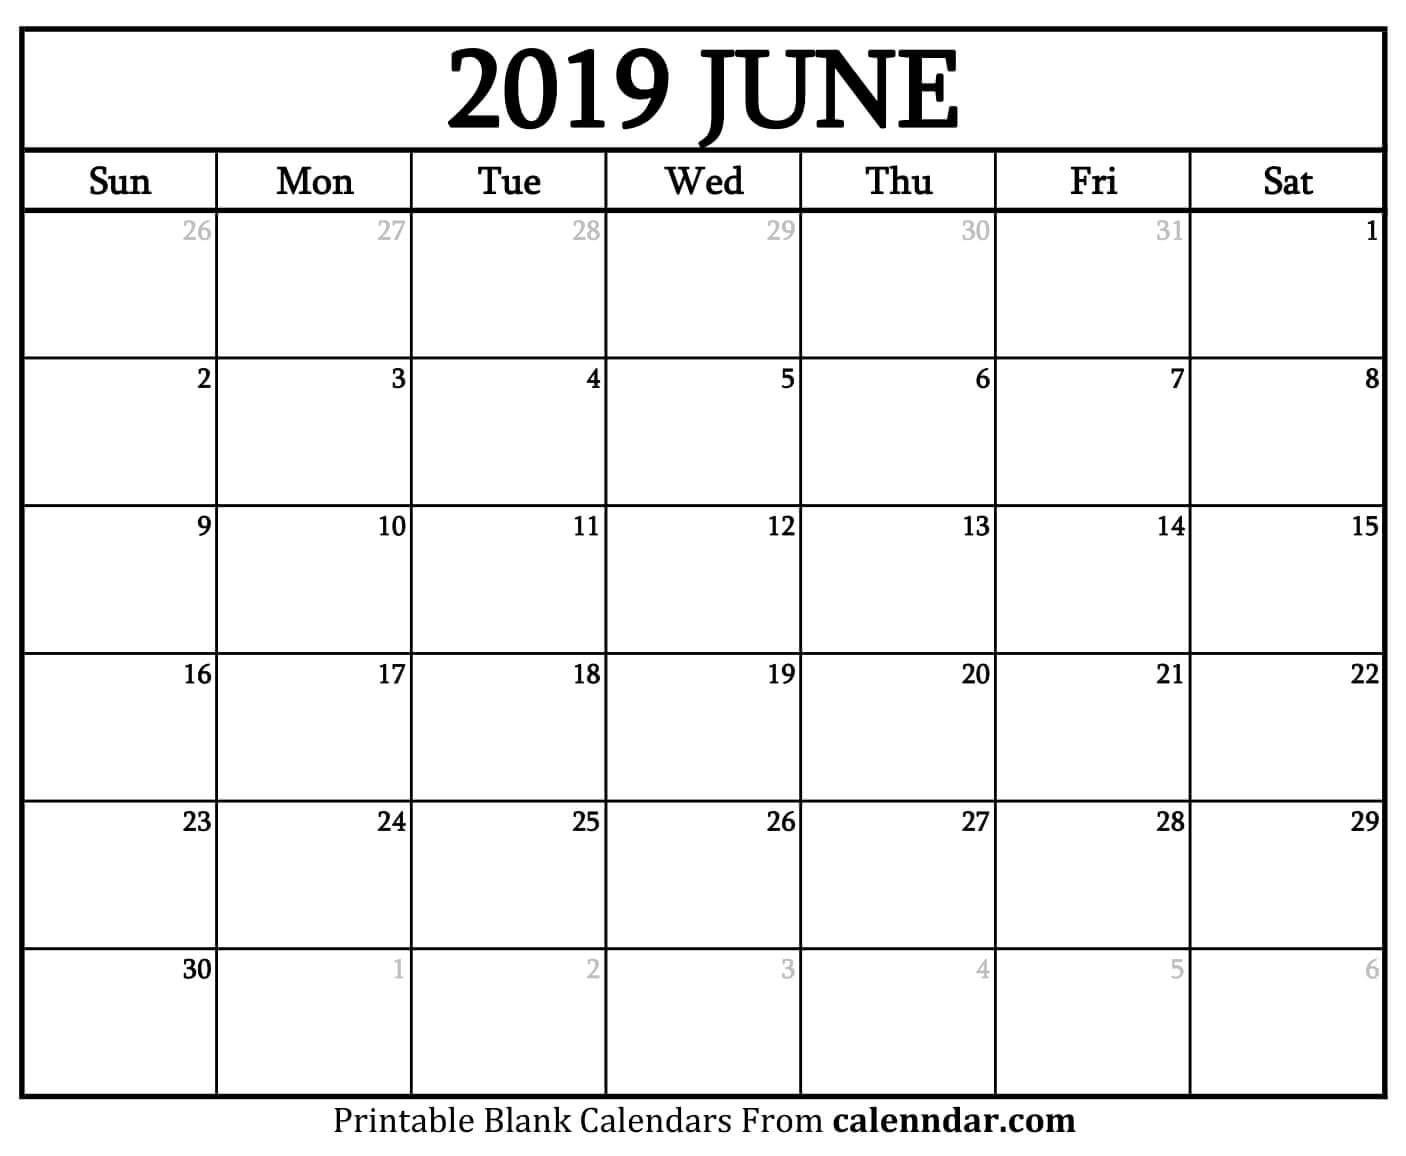 June 2019 Calendar Printable | Blank June 2019 Calendar Printable